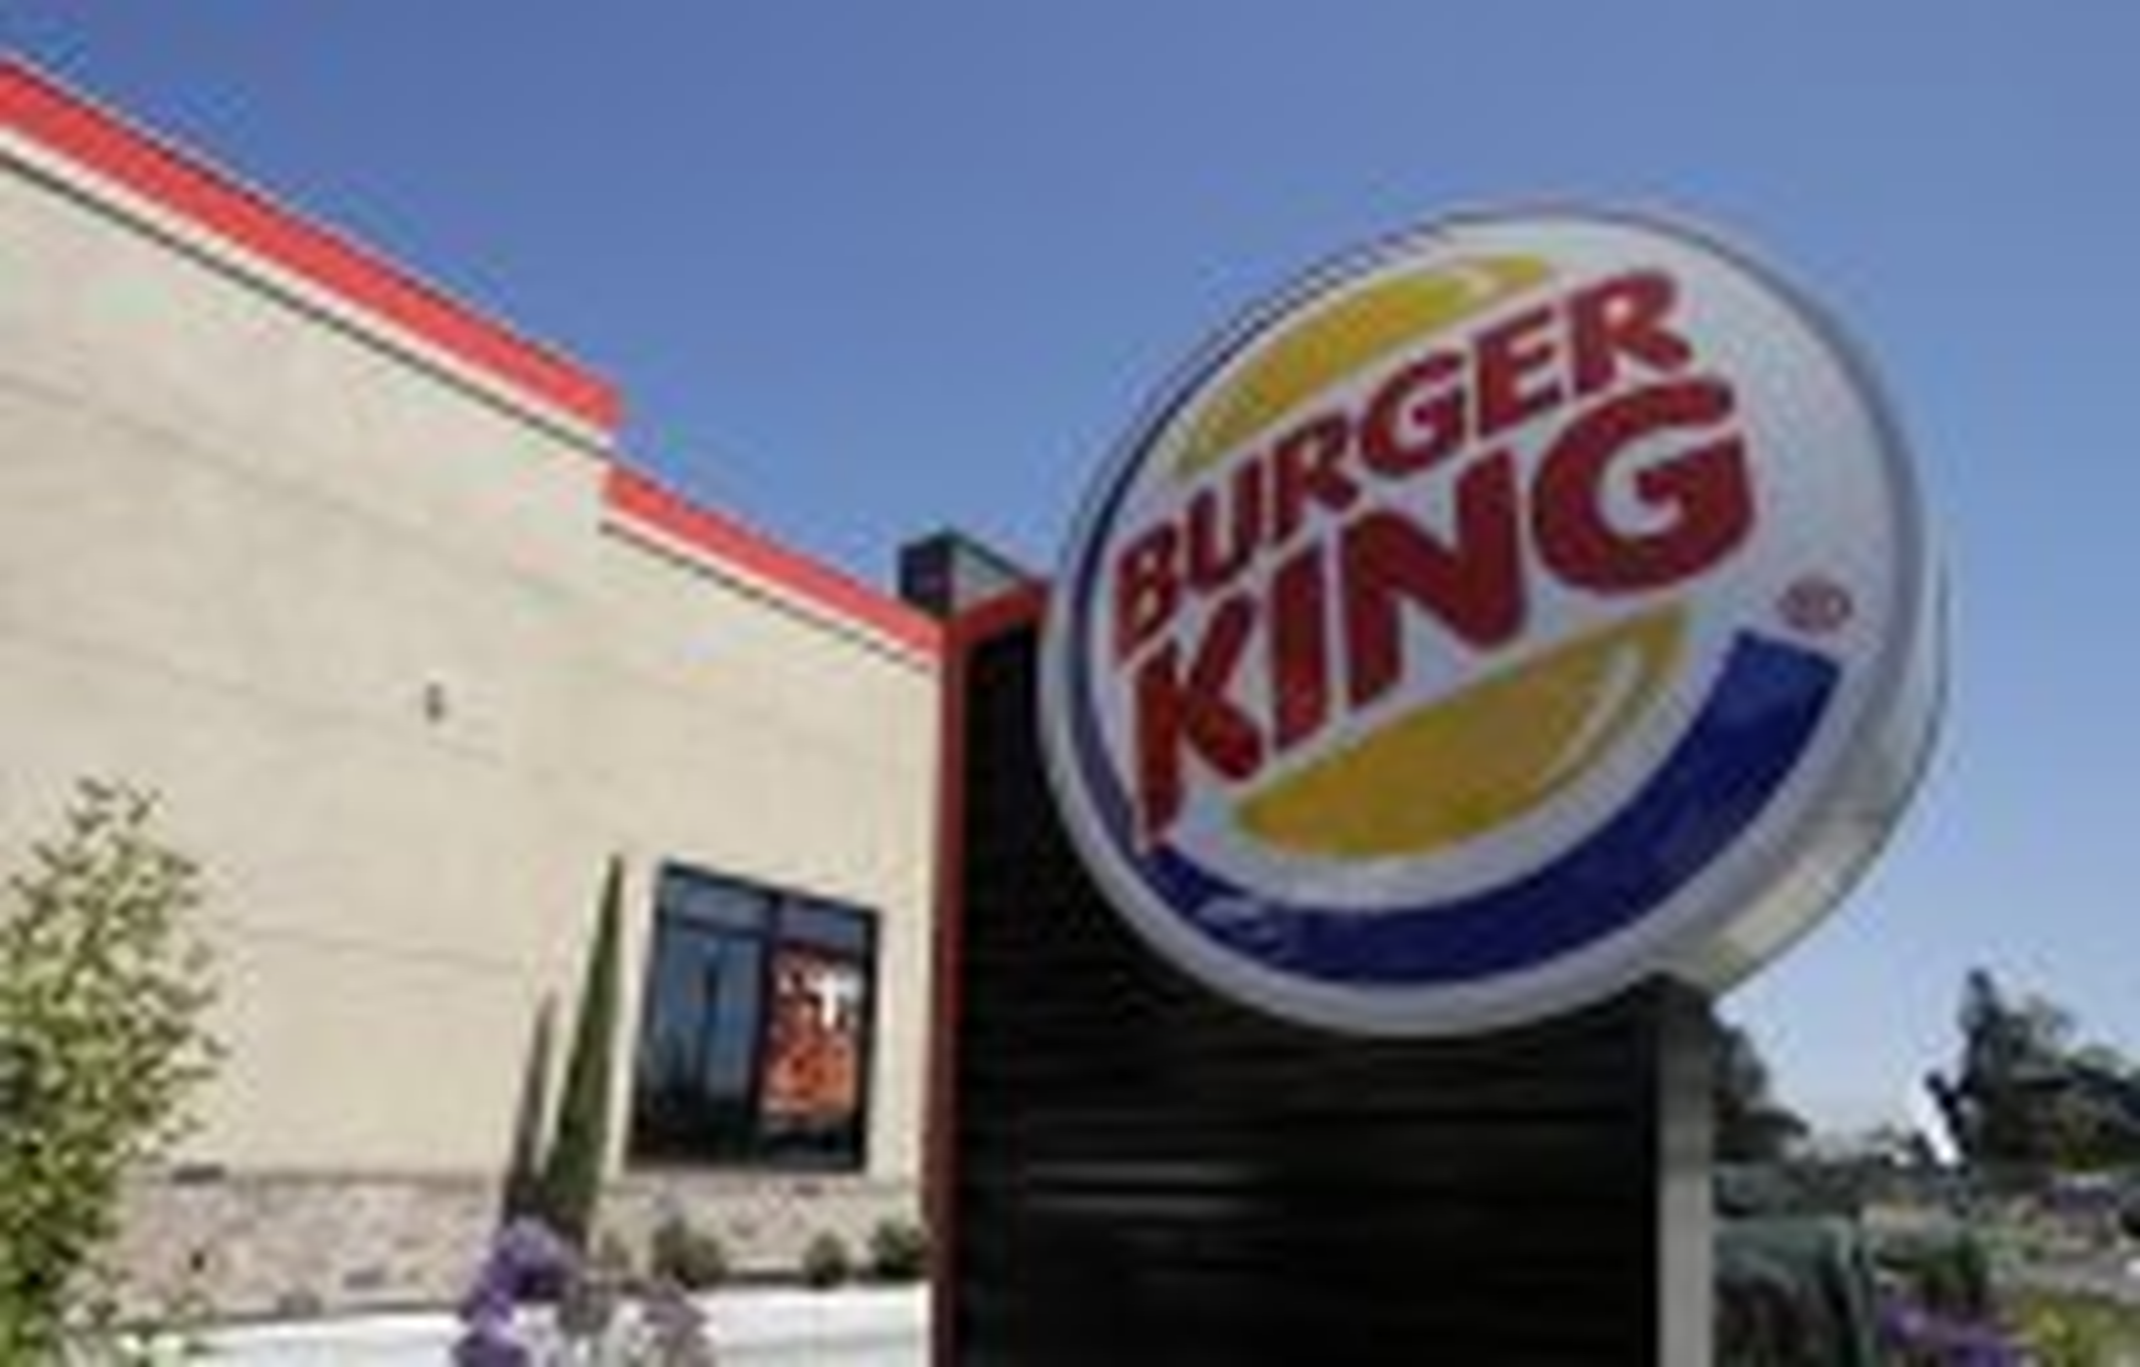 Burger King eyes big bite of Europe market with 'veggie Whopper'